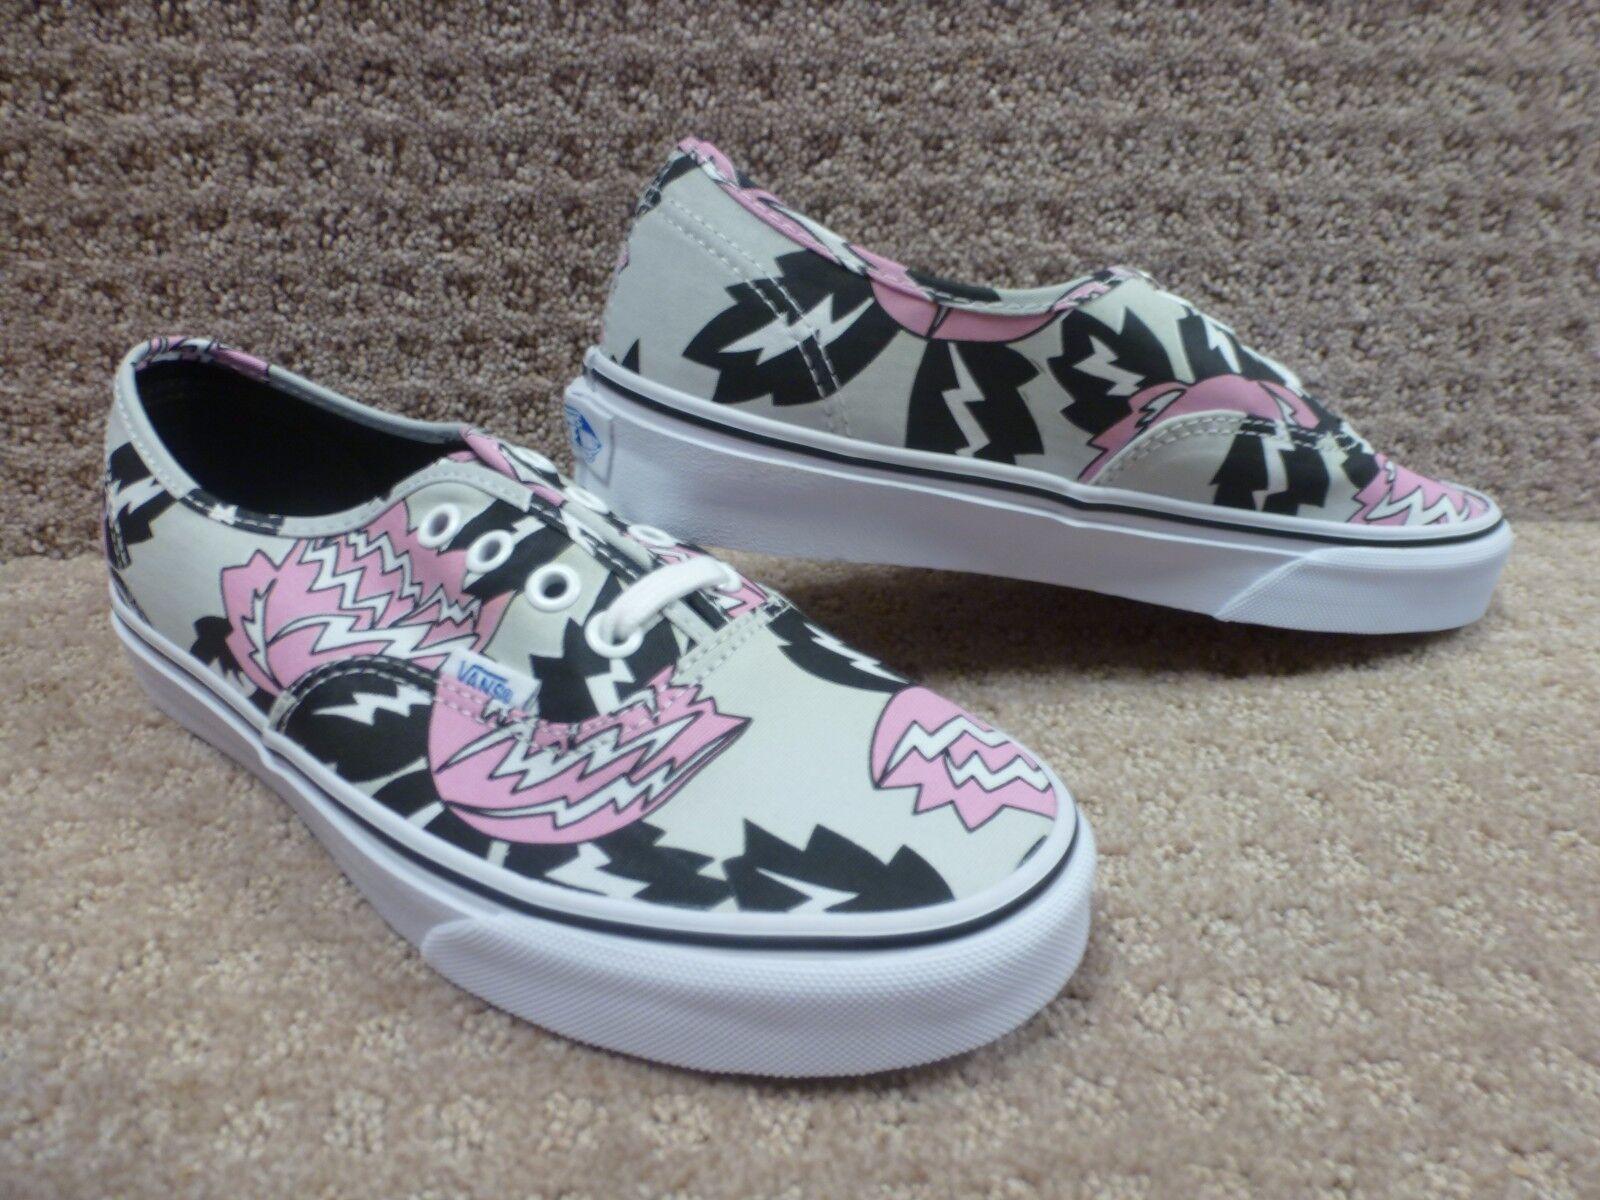 OTOVans Men's shoes Authentic -- (Eley Kishimoto) MgnlHytr G